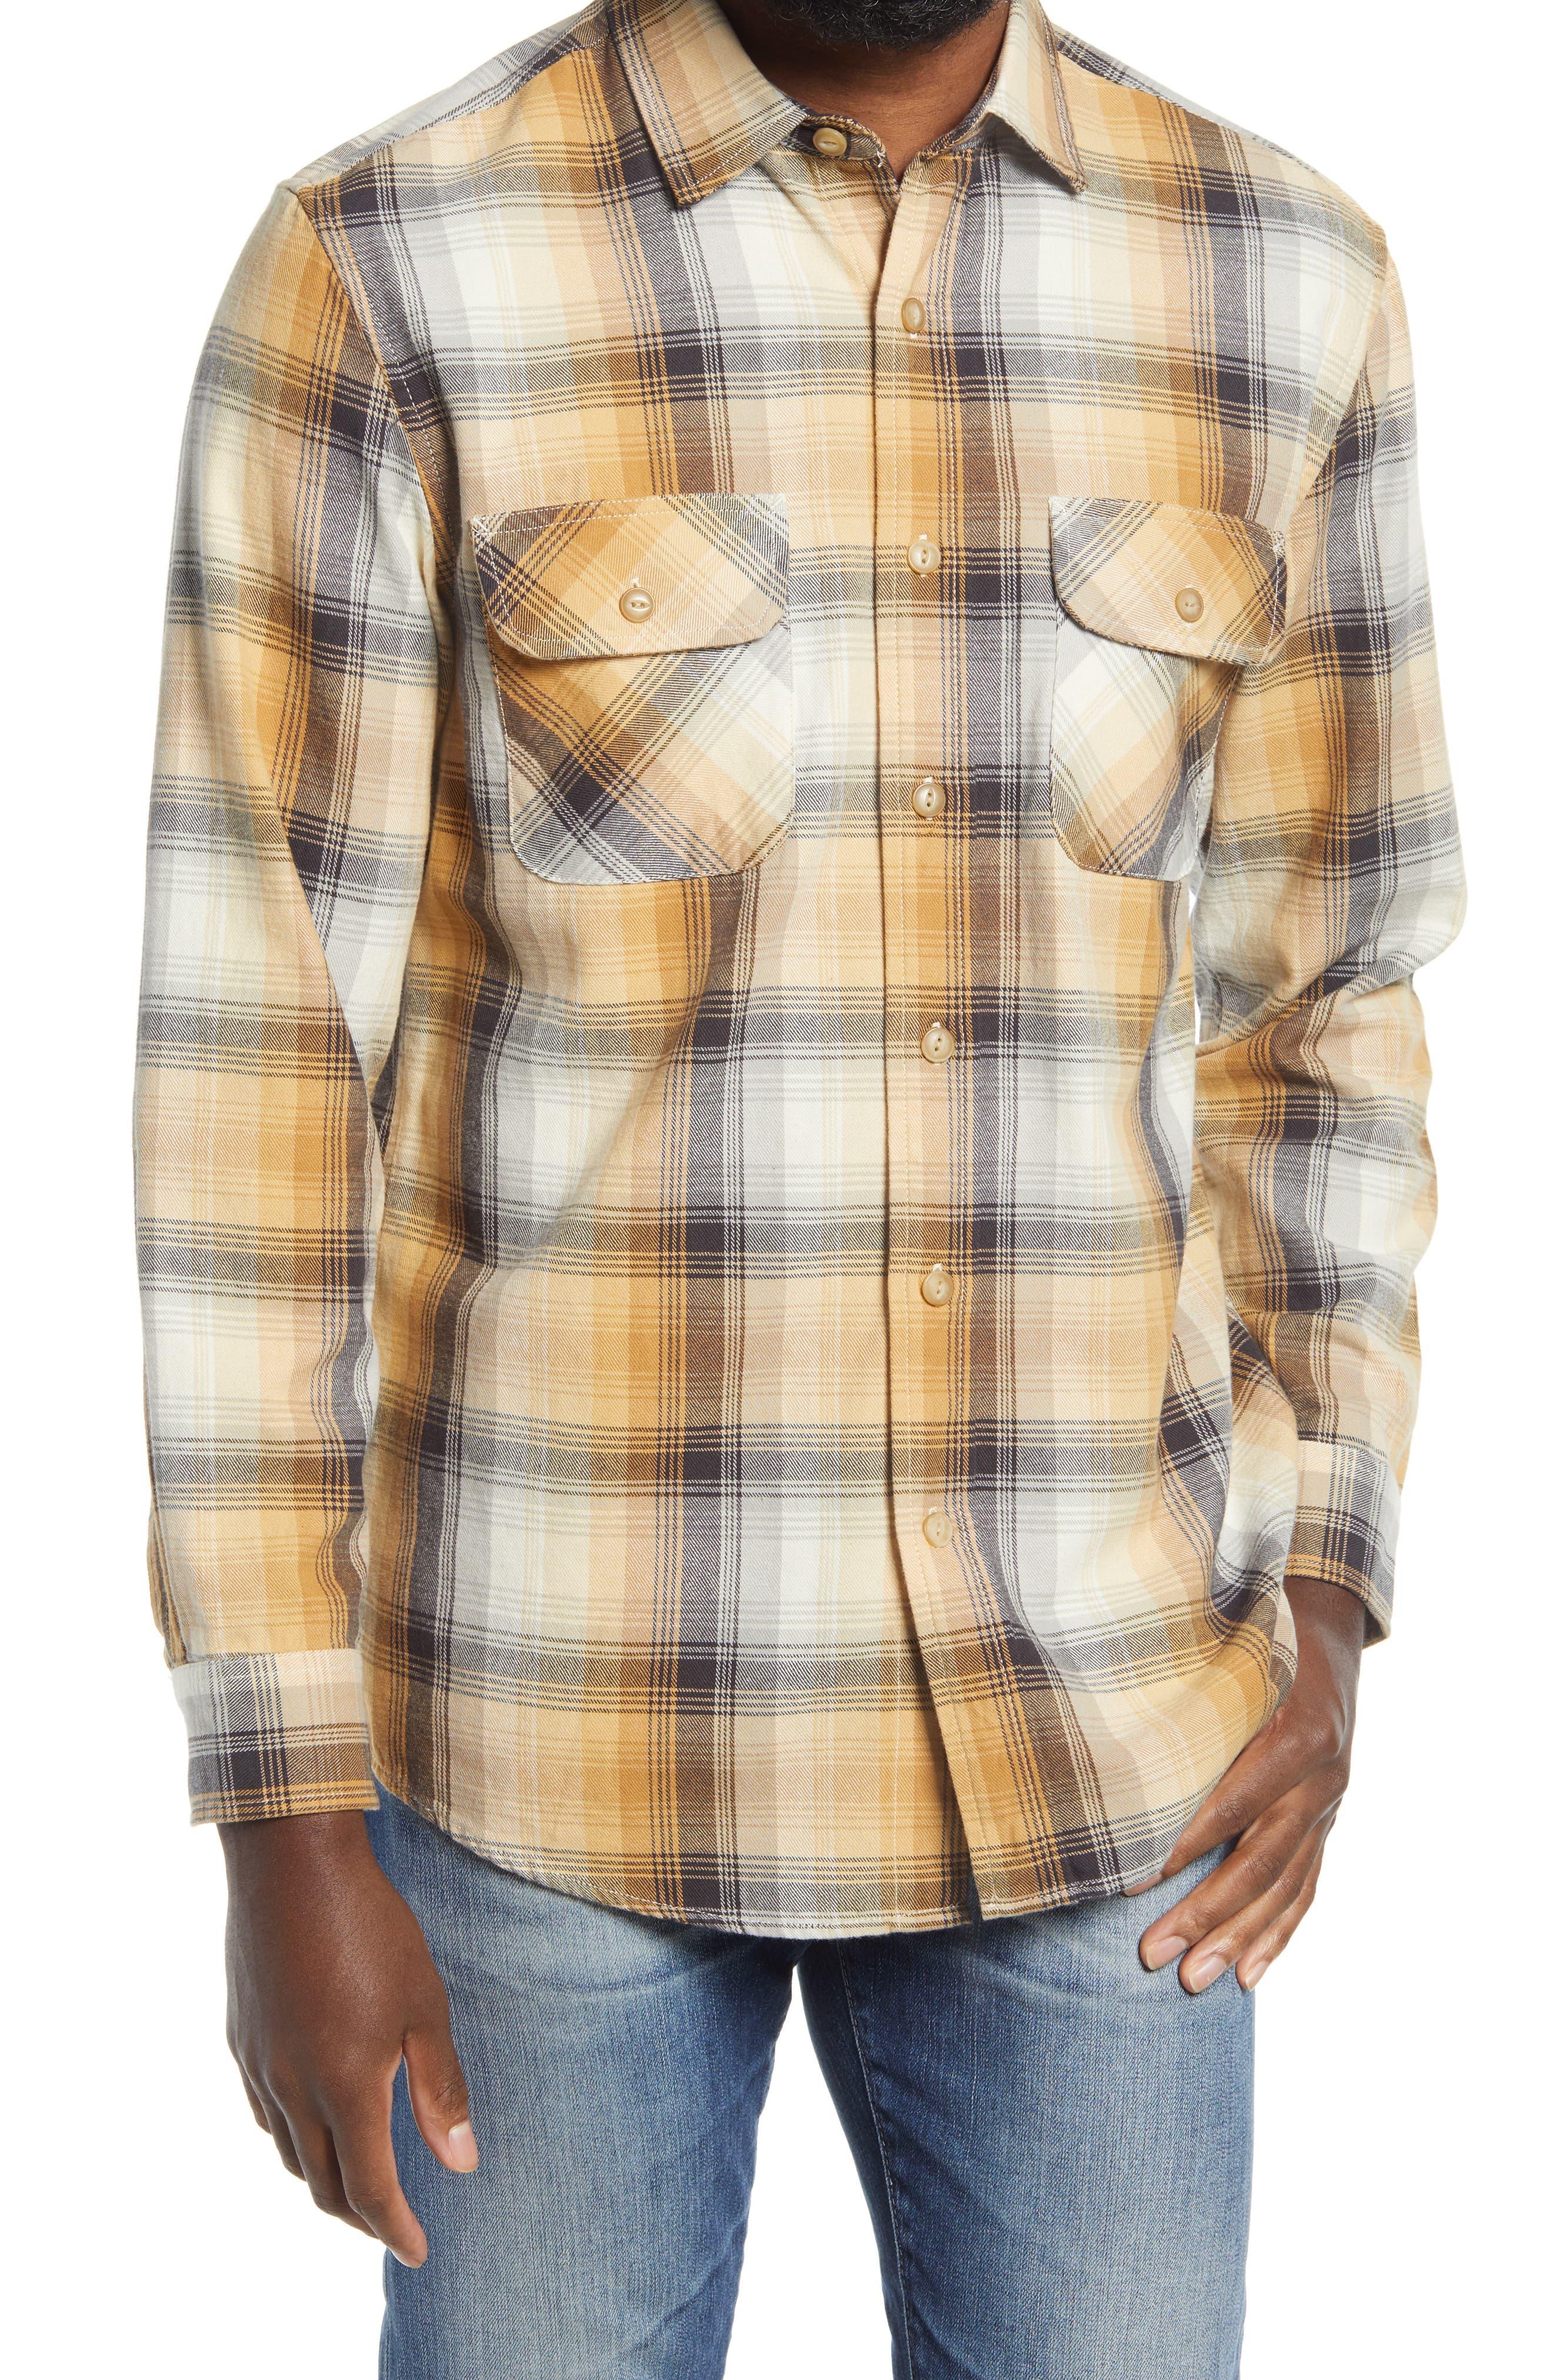 Easy 1940s Men's Fashion Guide Mens Pendleton Beach Shack Plaid Button-Up Shirt Size X-Large - Brown $89.50 AT vintagedancer.com